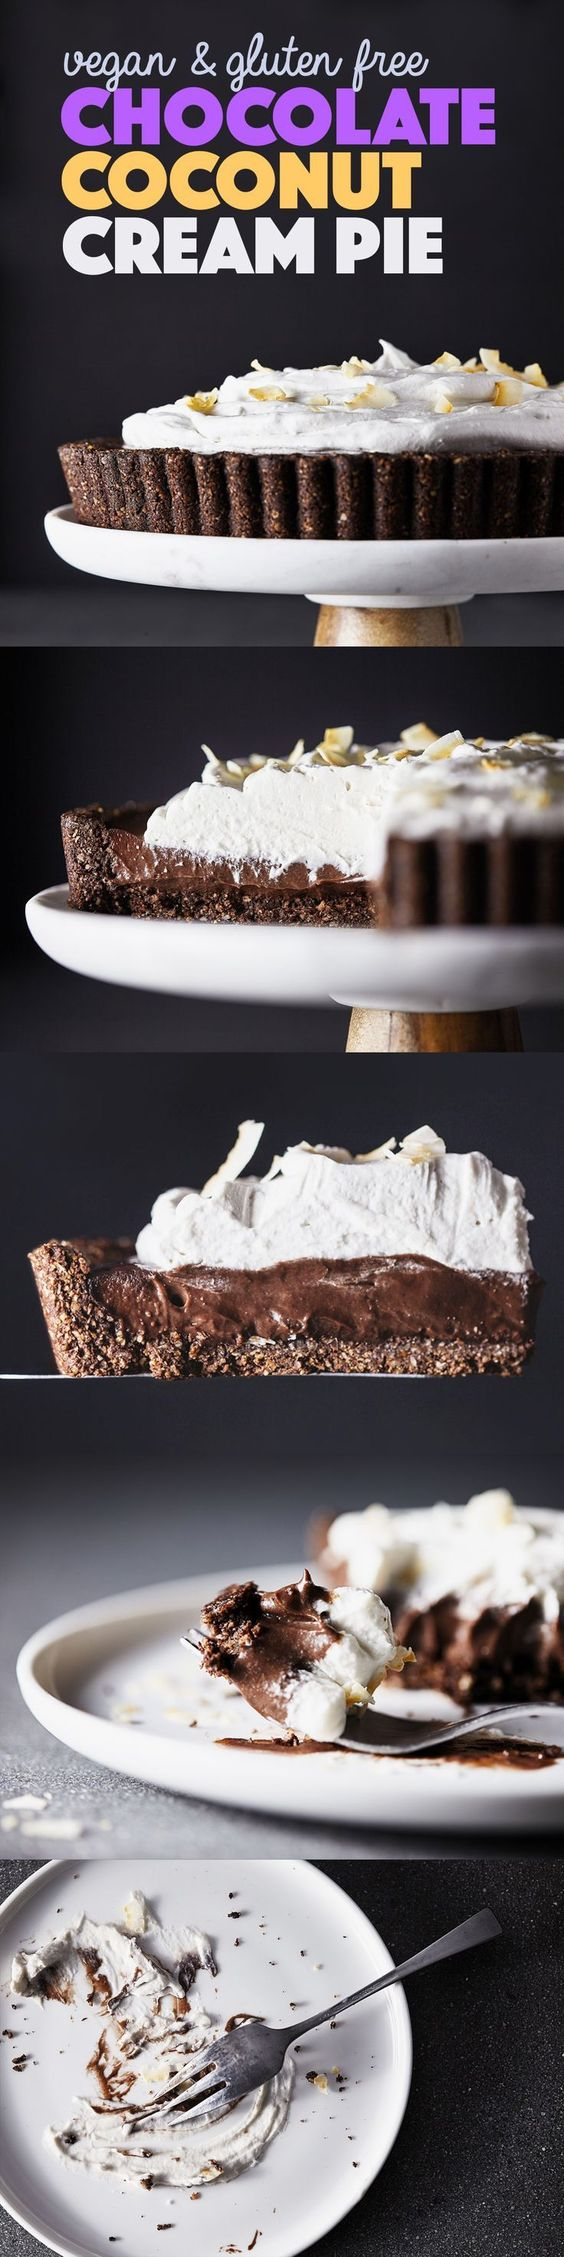 banana cream pie with whole grain pie crust whole grain pie crust ...